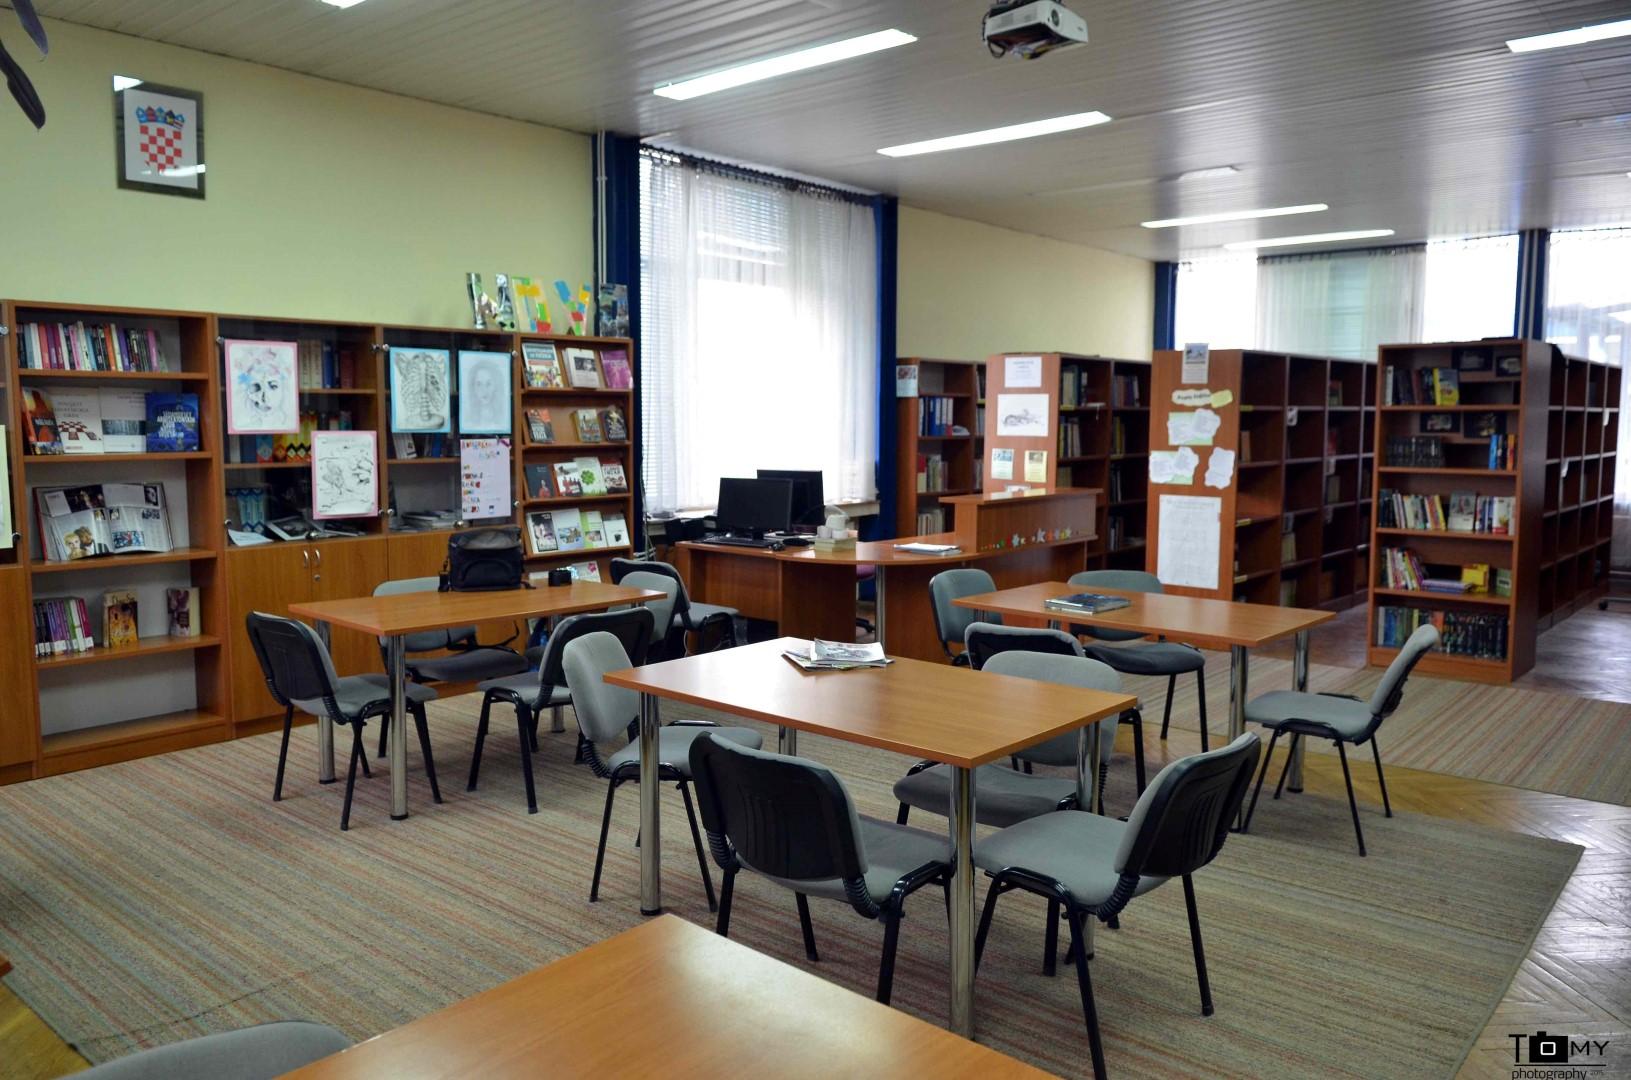 Projekt Kvalitetna škola